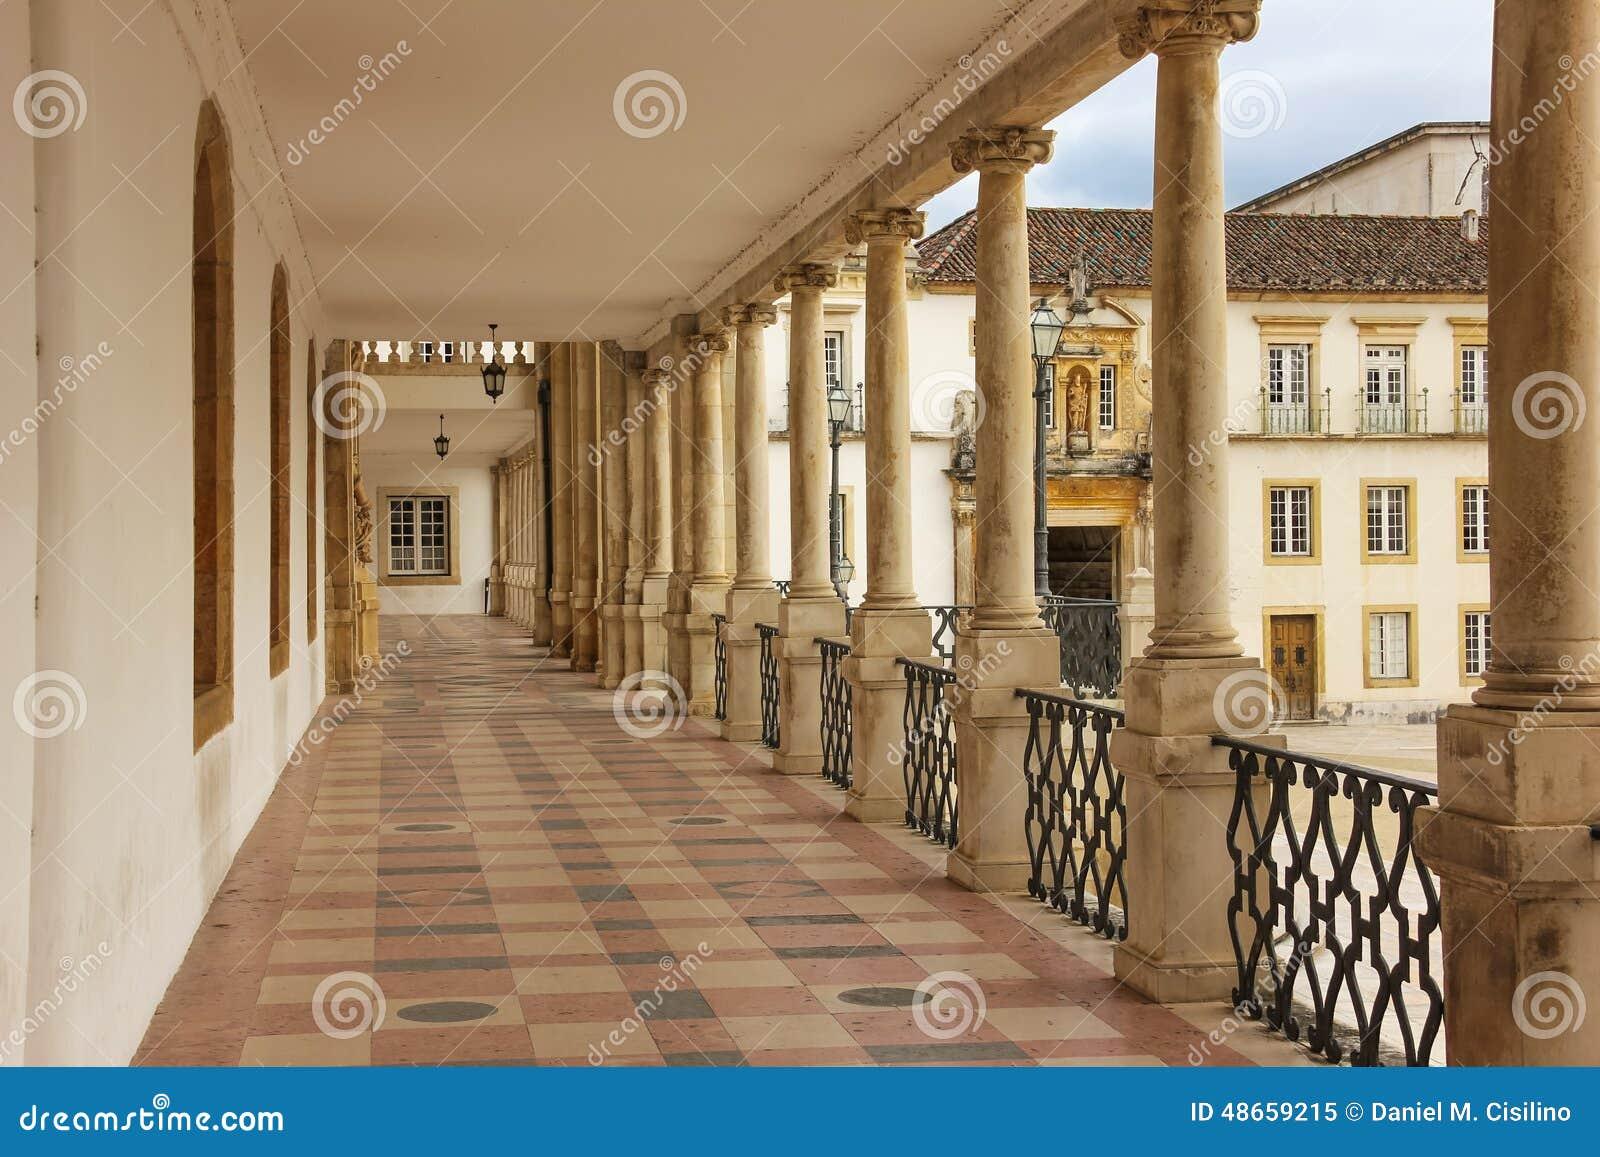 Corridor and main entrance at the university coimbra portugal stock photo image 48659215 - Corridor entrance ...